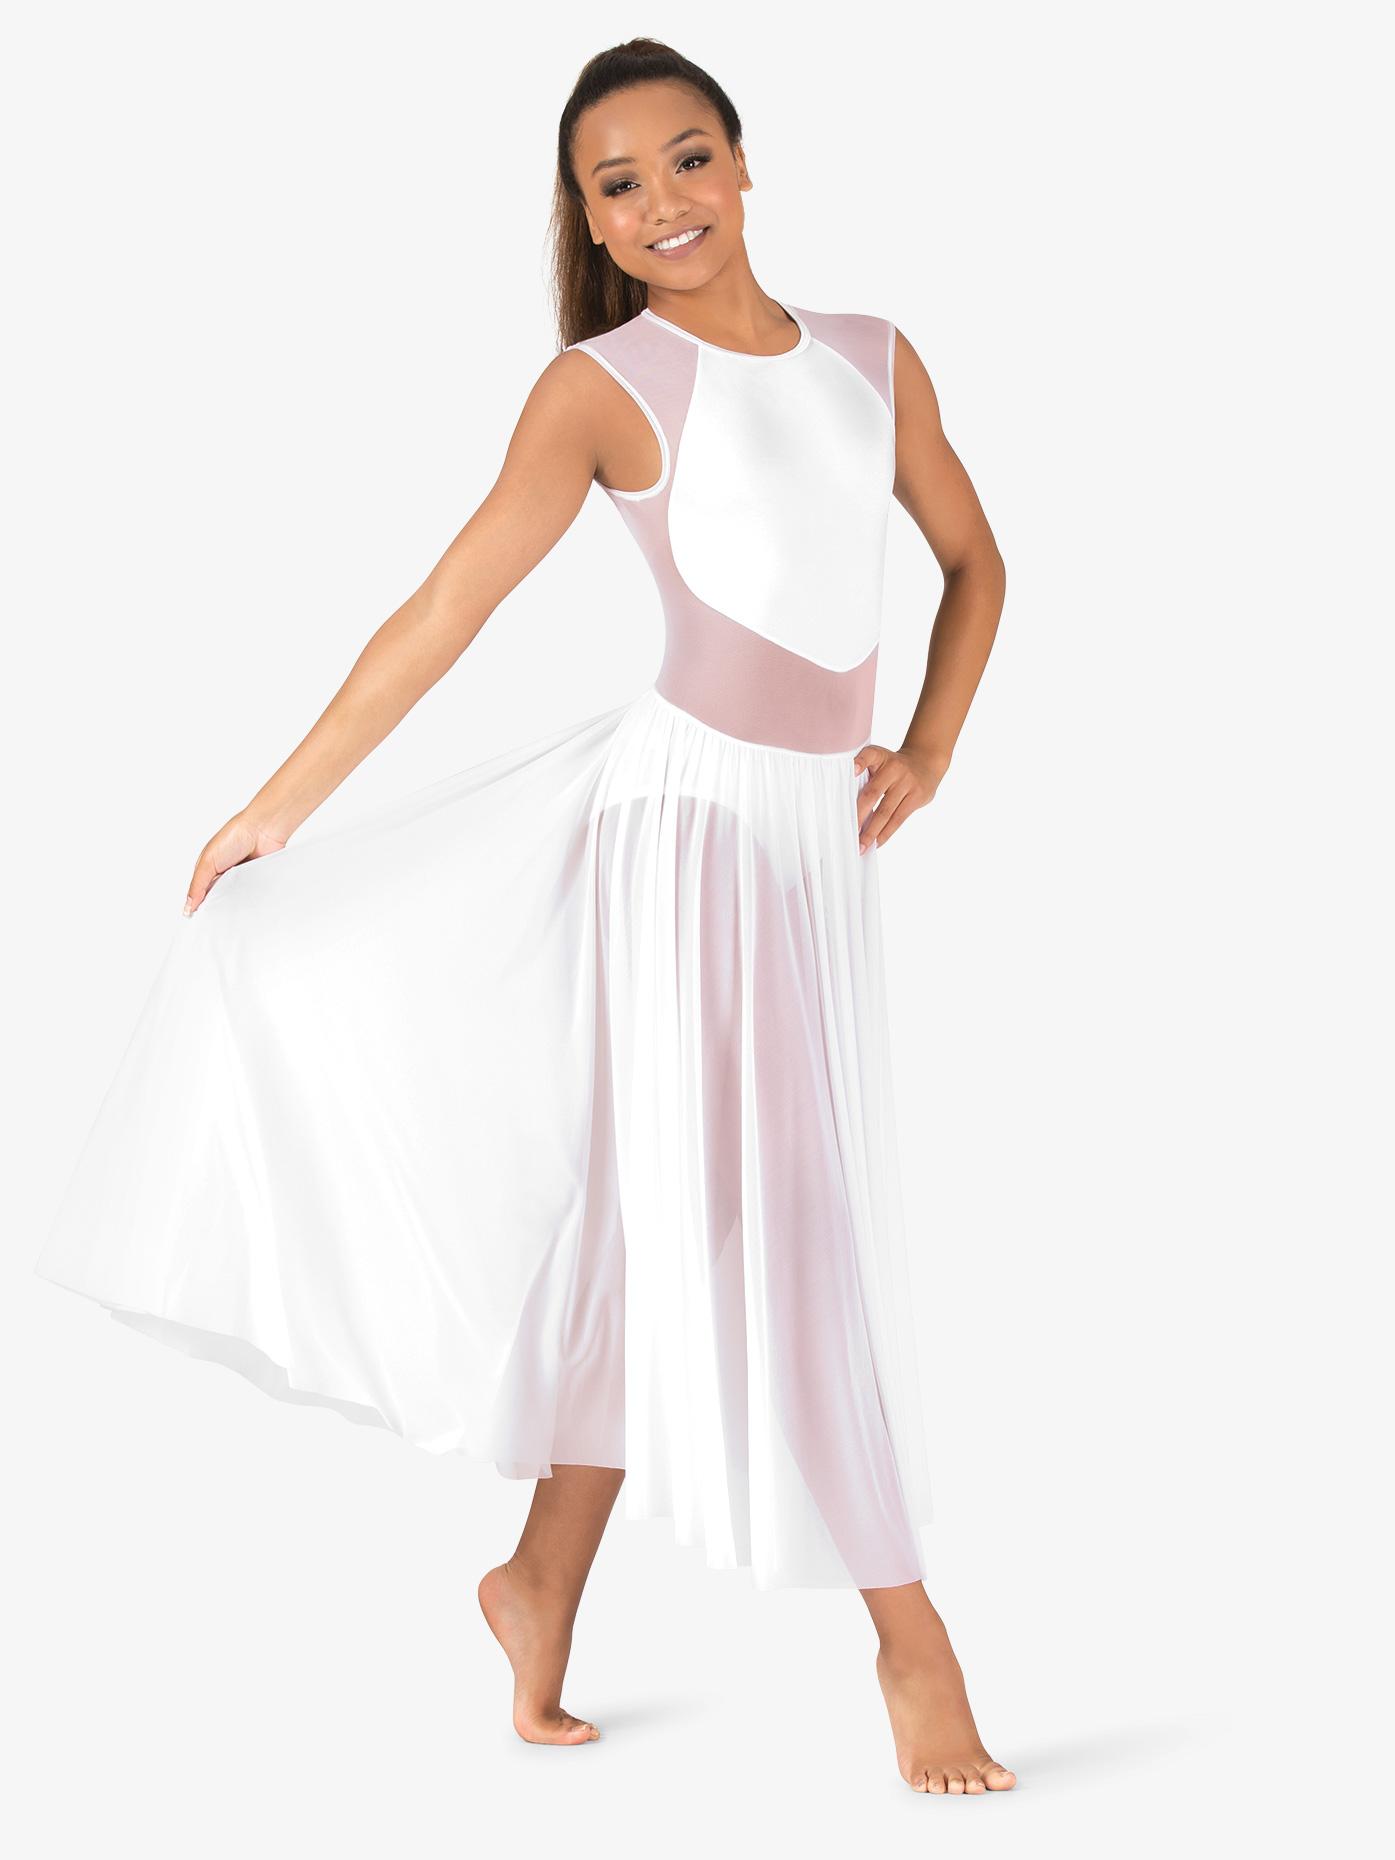 Double Platinum Womens Performance Mesh Cap Sleeve Dress N7702